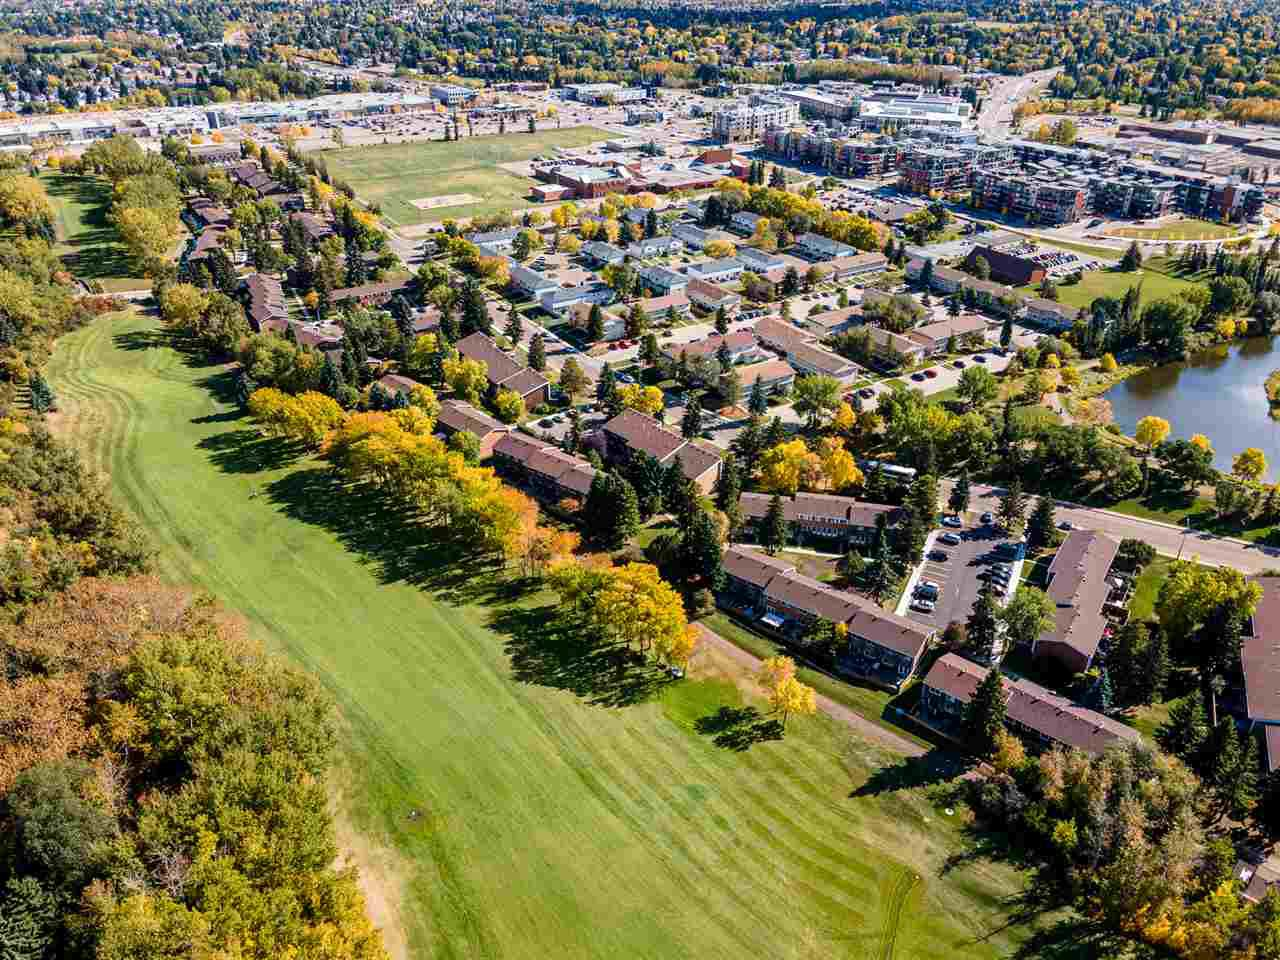 Main Photo: 135 GREAT Oaks: Sherwood Park Townhouse for sale : MLS®# E4215495